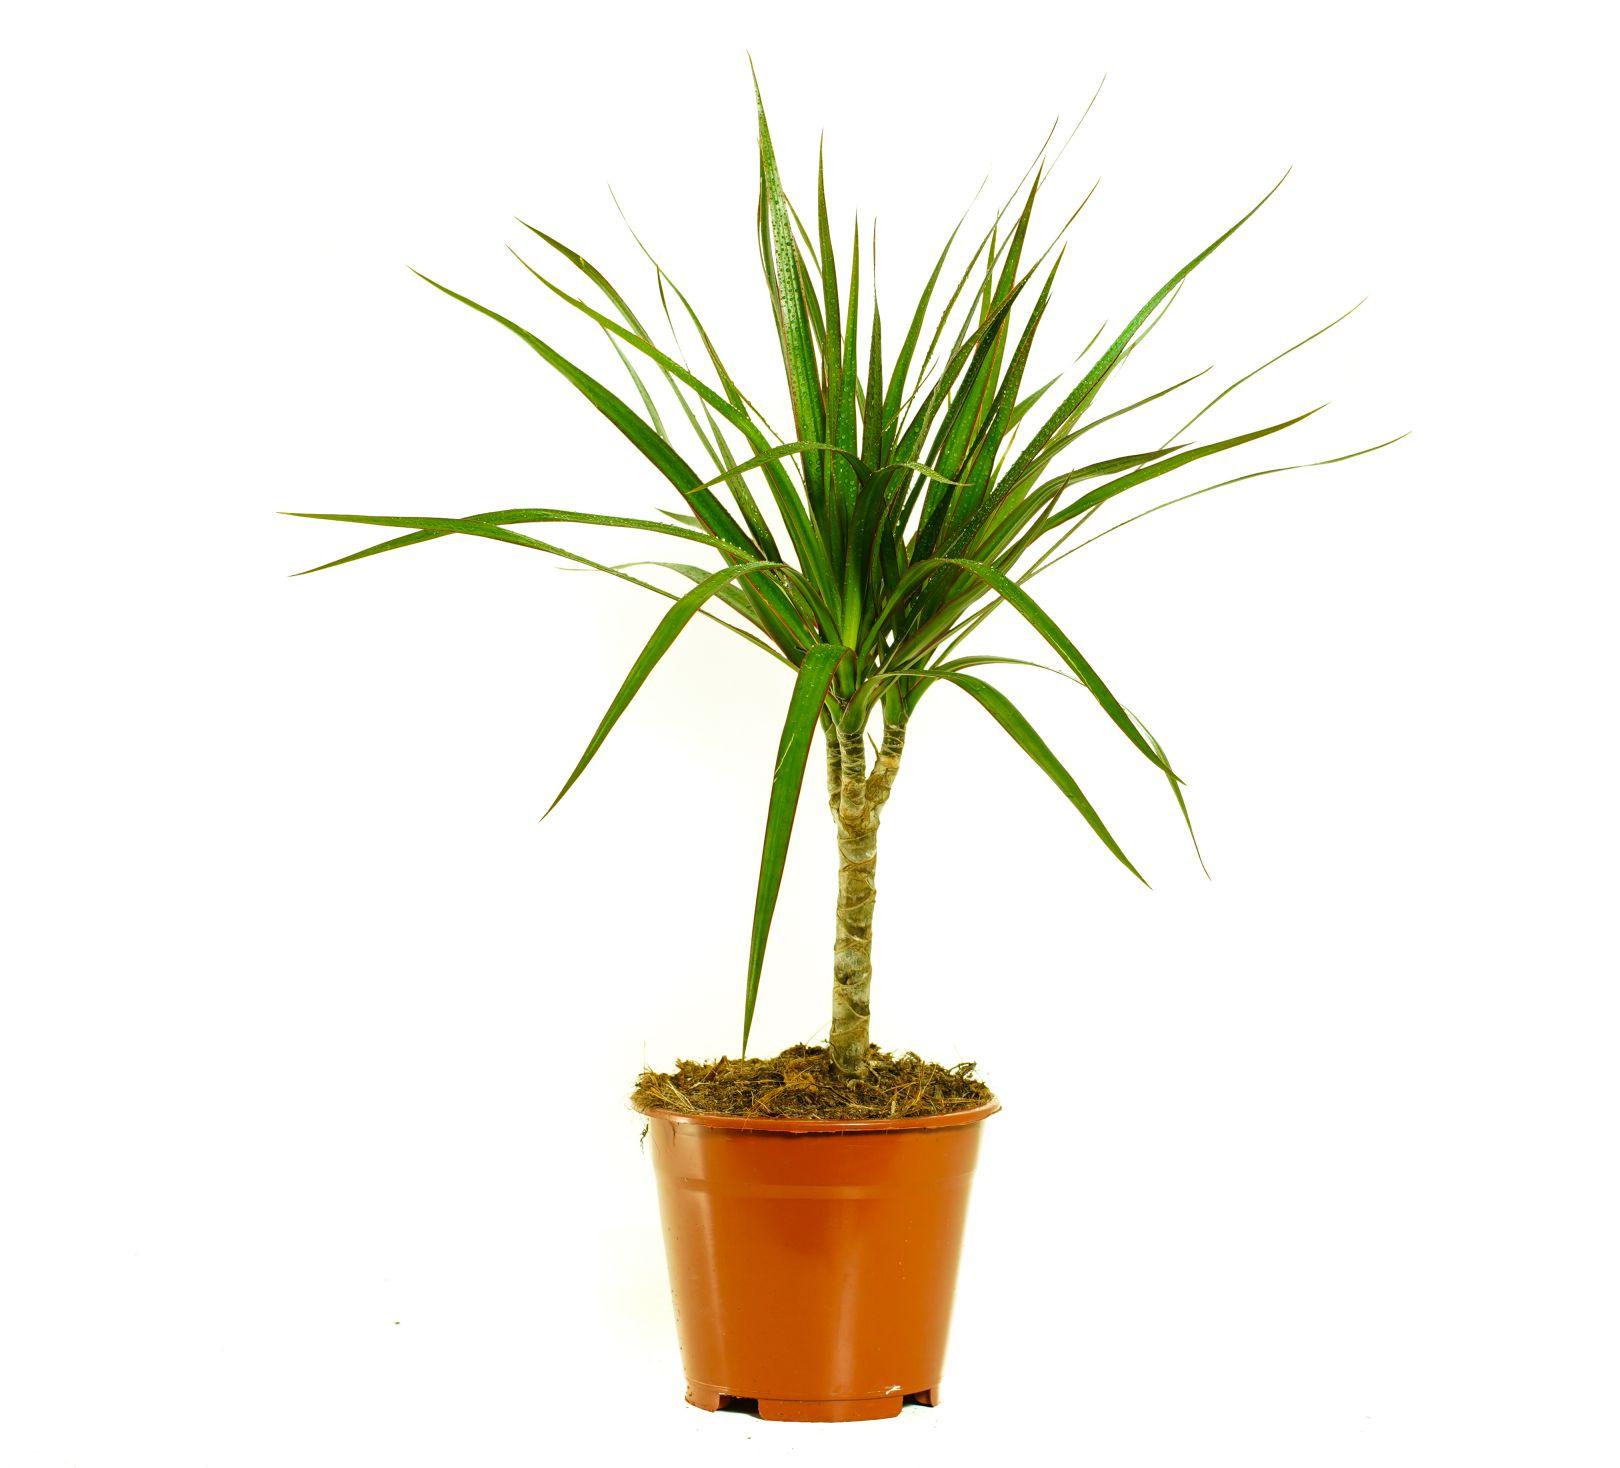 Dracaena Marginata 1 Cutting 'Indoor Plants'